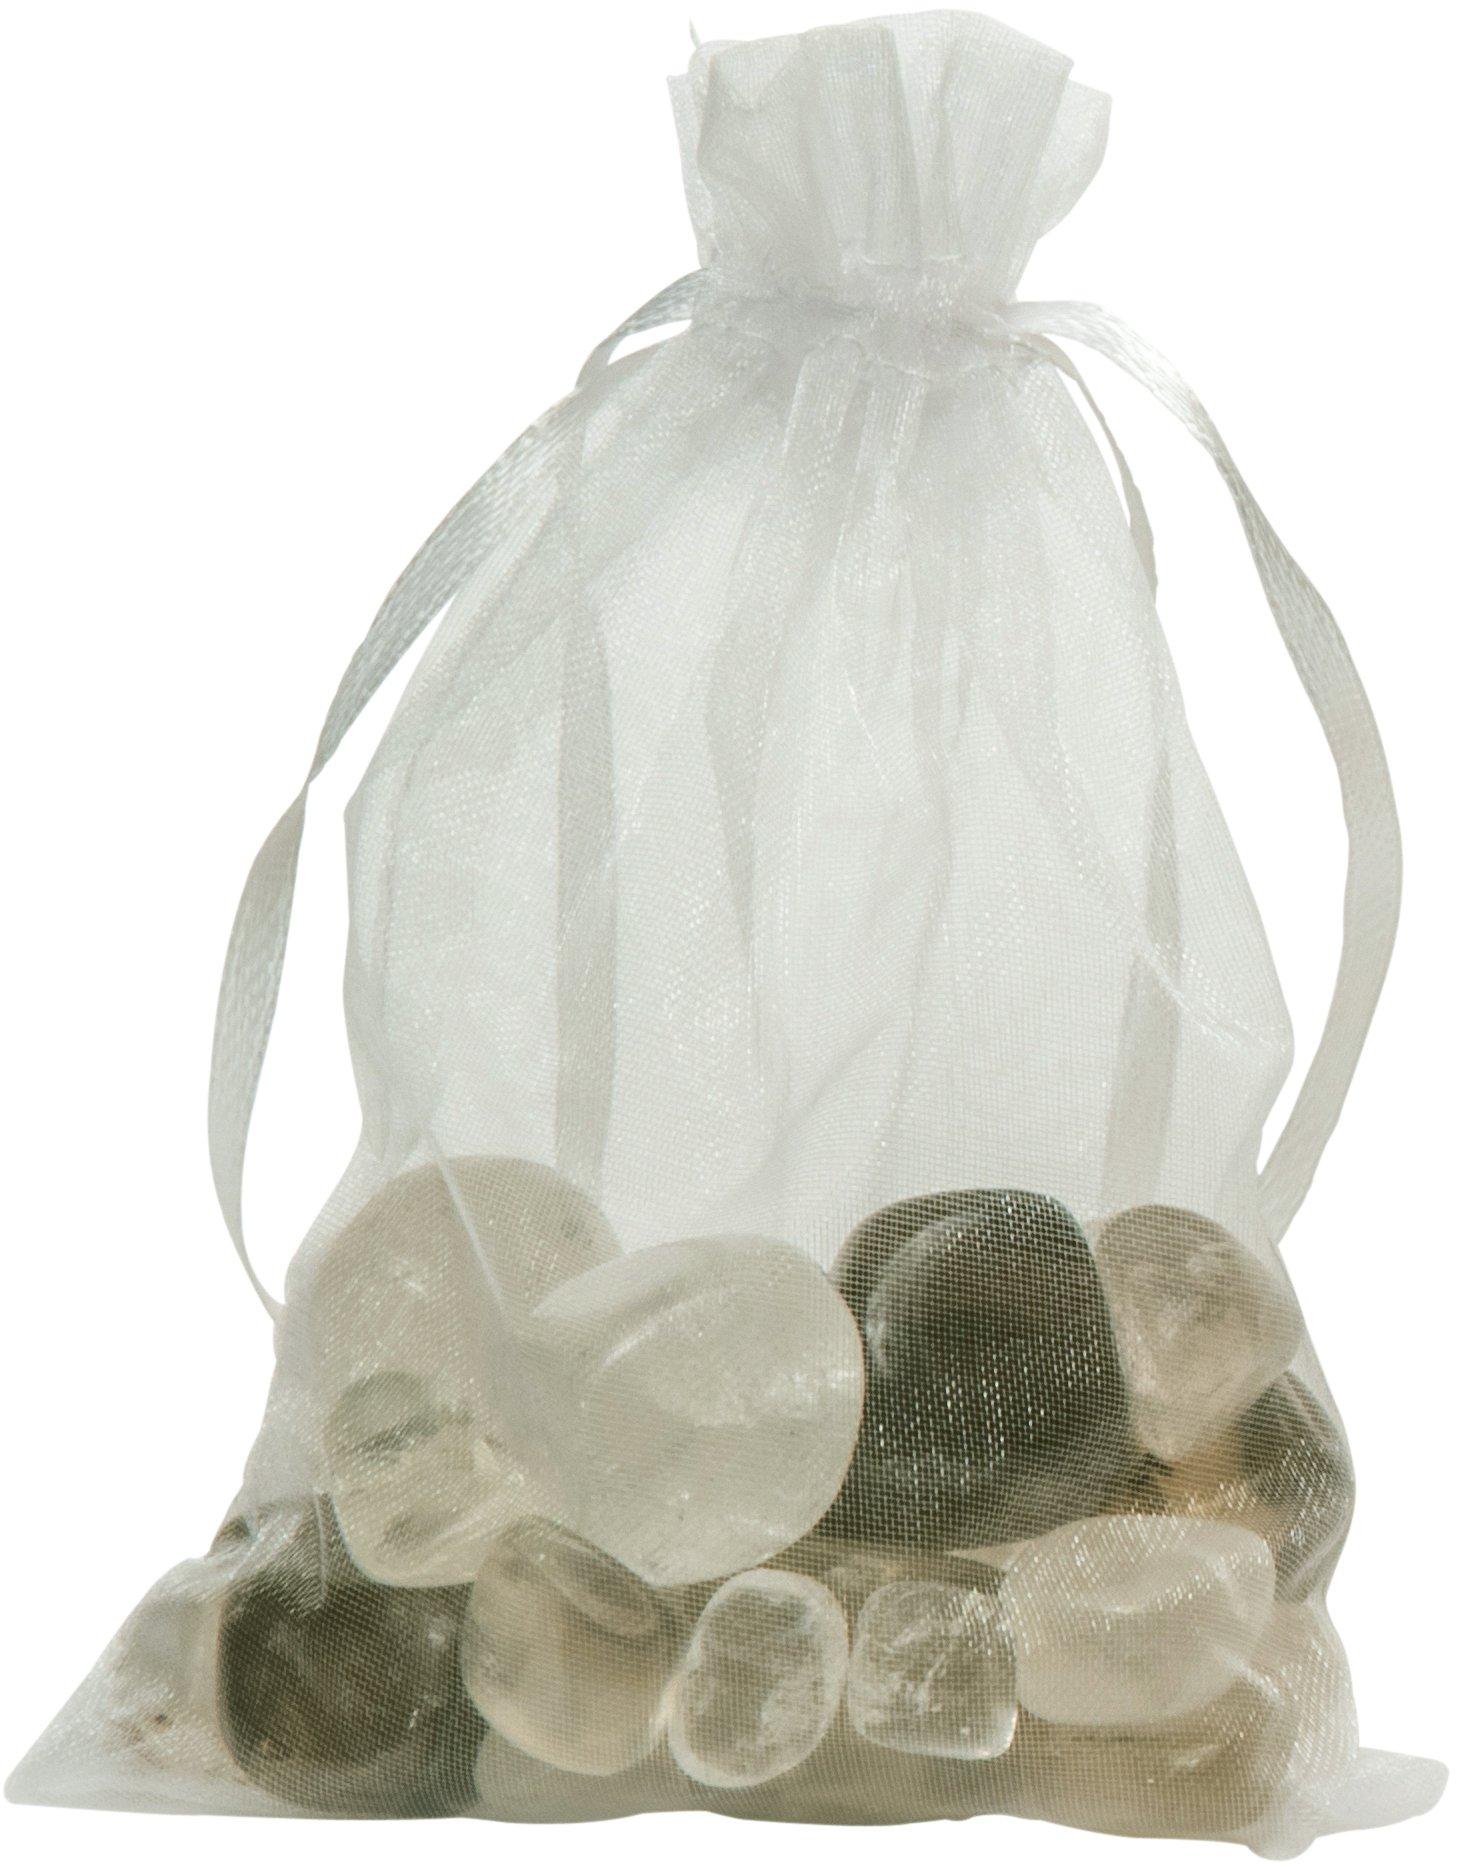 Gemstone Well Additional Gemstone Set for Elixir2Go Gemstone Water Bottle   Loose Tumbled Gemstones for Making Gemwater   Crystal Set for Crystal Elixir Water Bottle (Smoky Quartz & Clear Quartz)